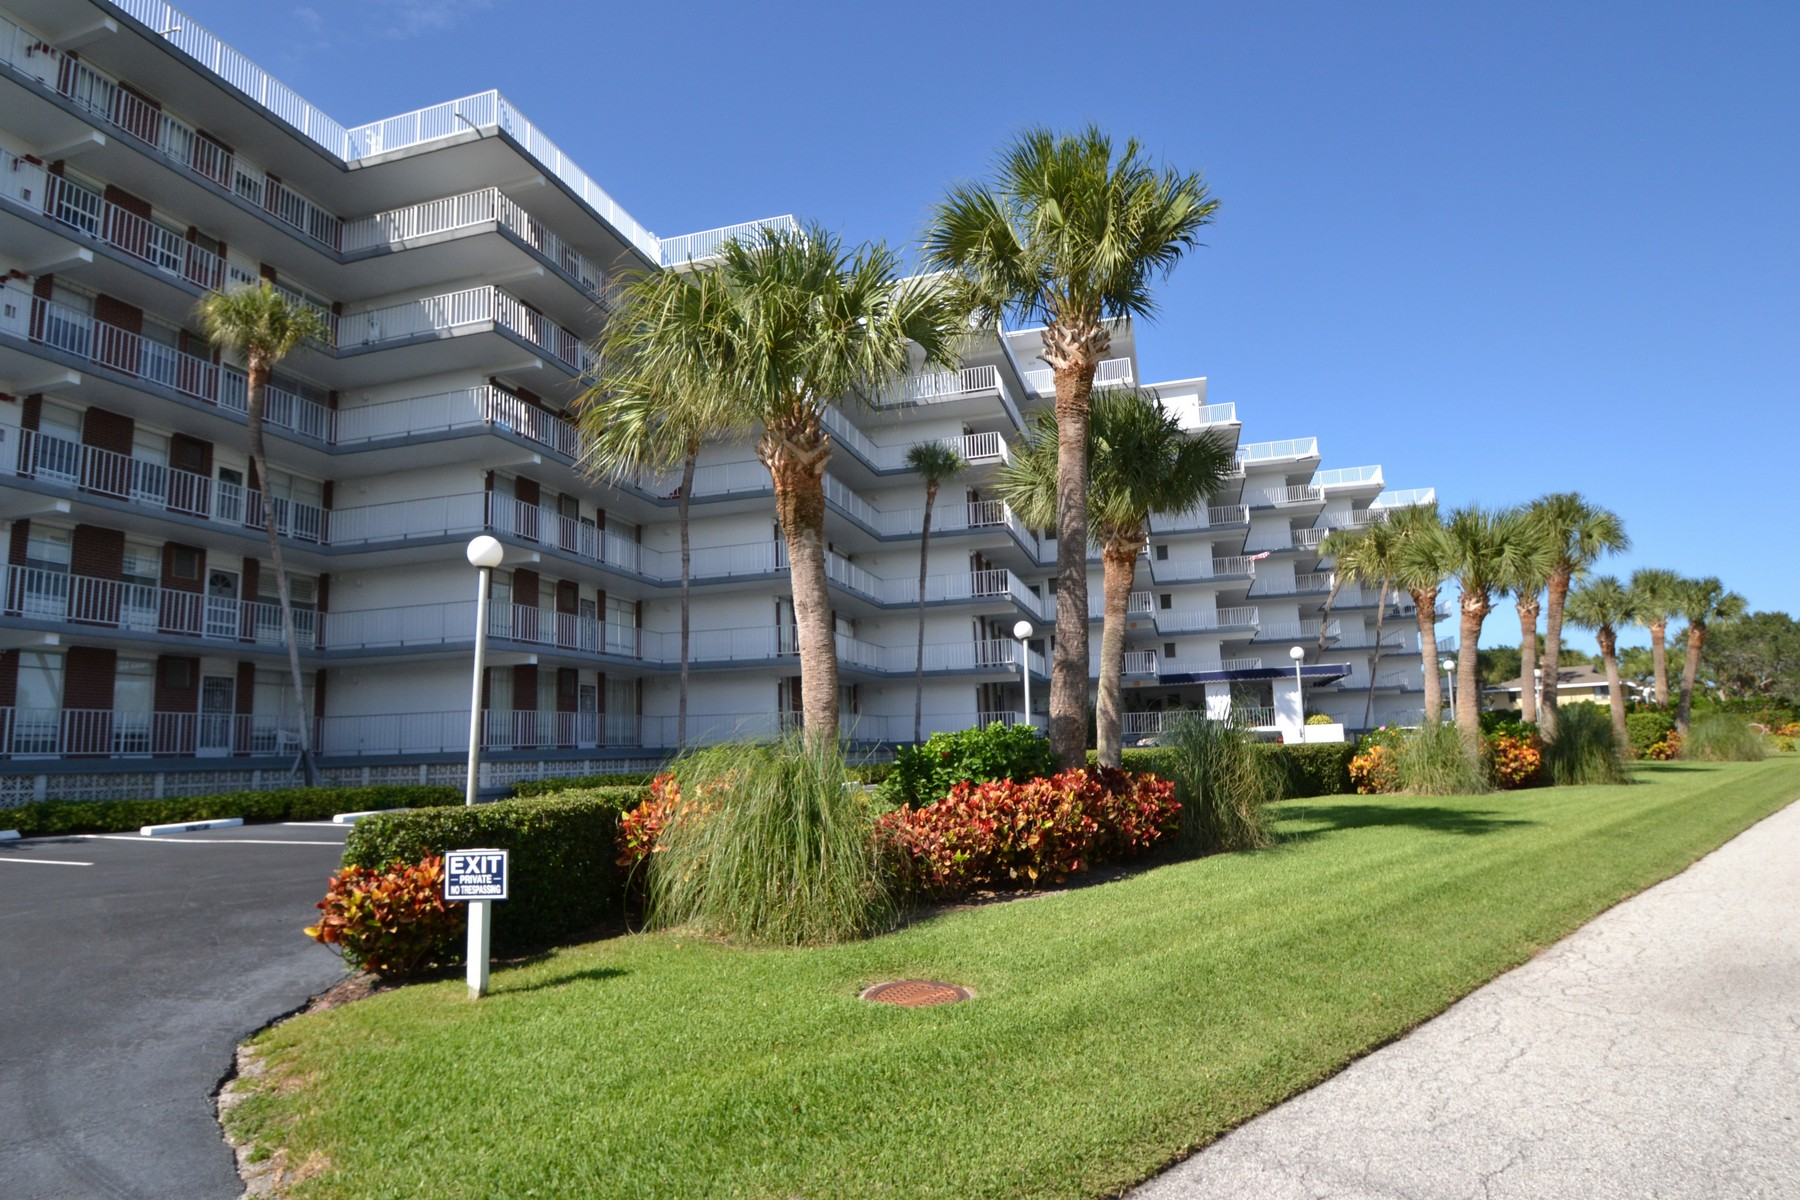 Only Blocks To The Beach! 935 E Causeway Blvd #205 Vero Beach, Florida 32963 Amerika Birleşik Devletleri